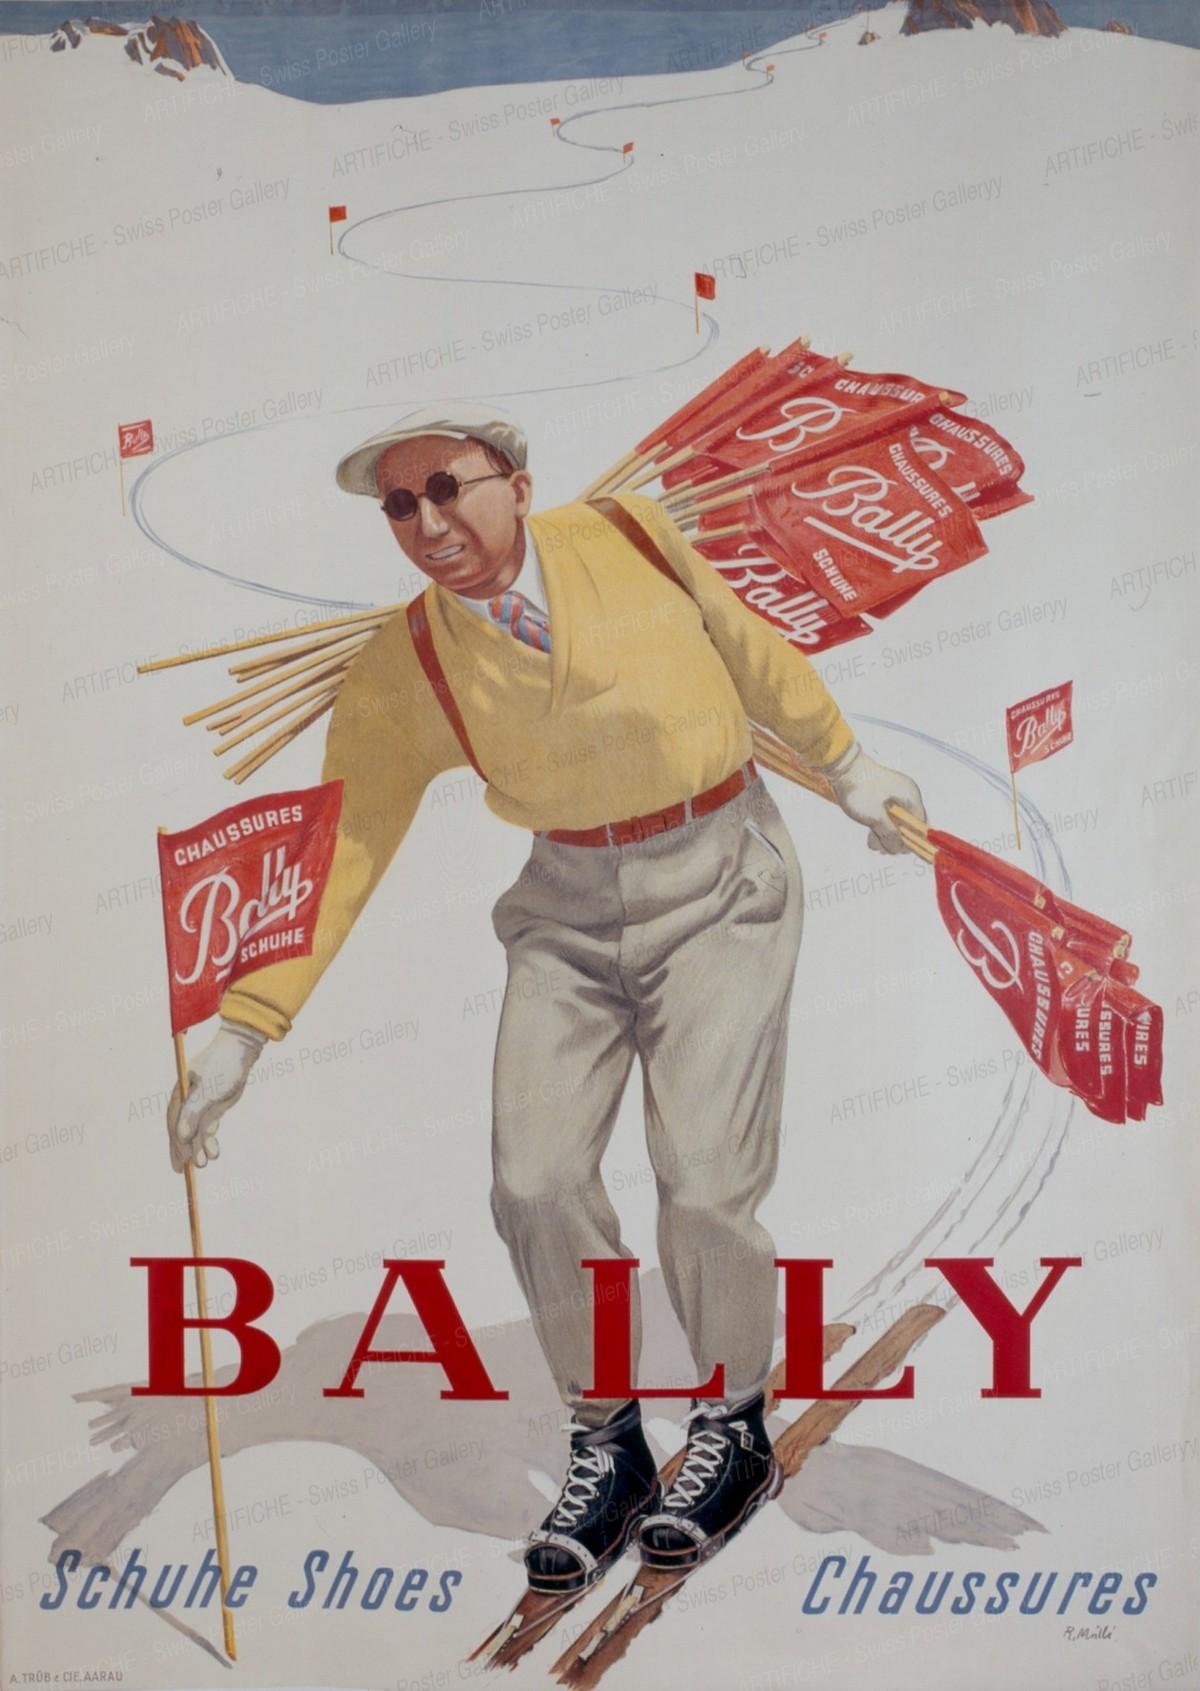 BALLY Schuhe Shoes Chaussures, Rudolf Mülli